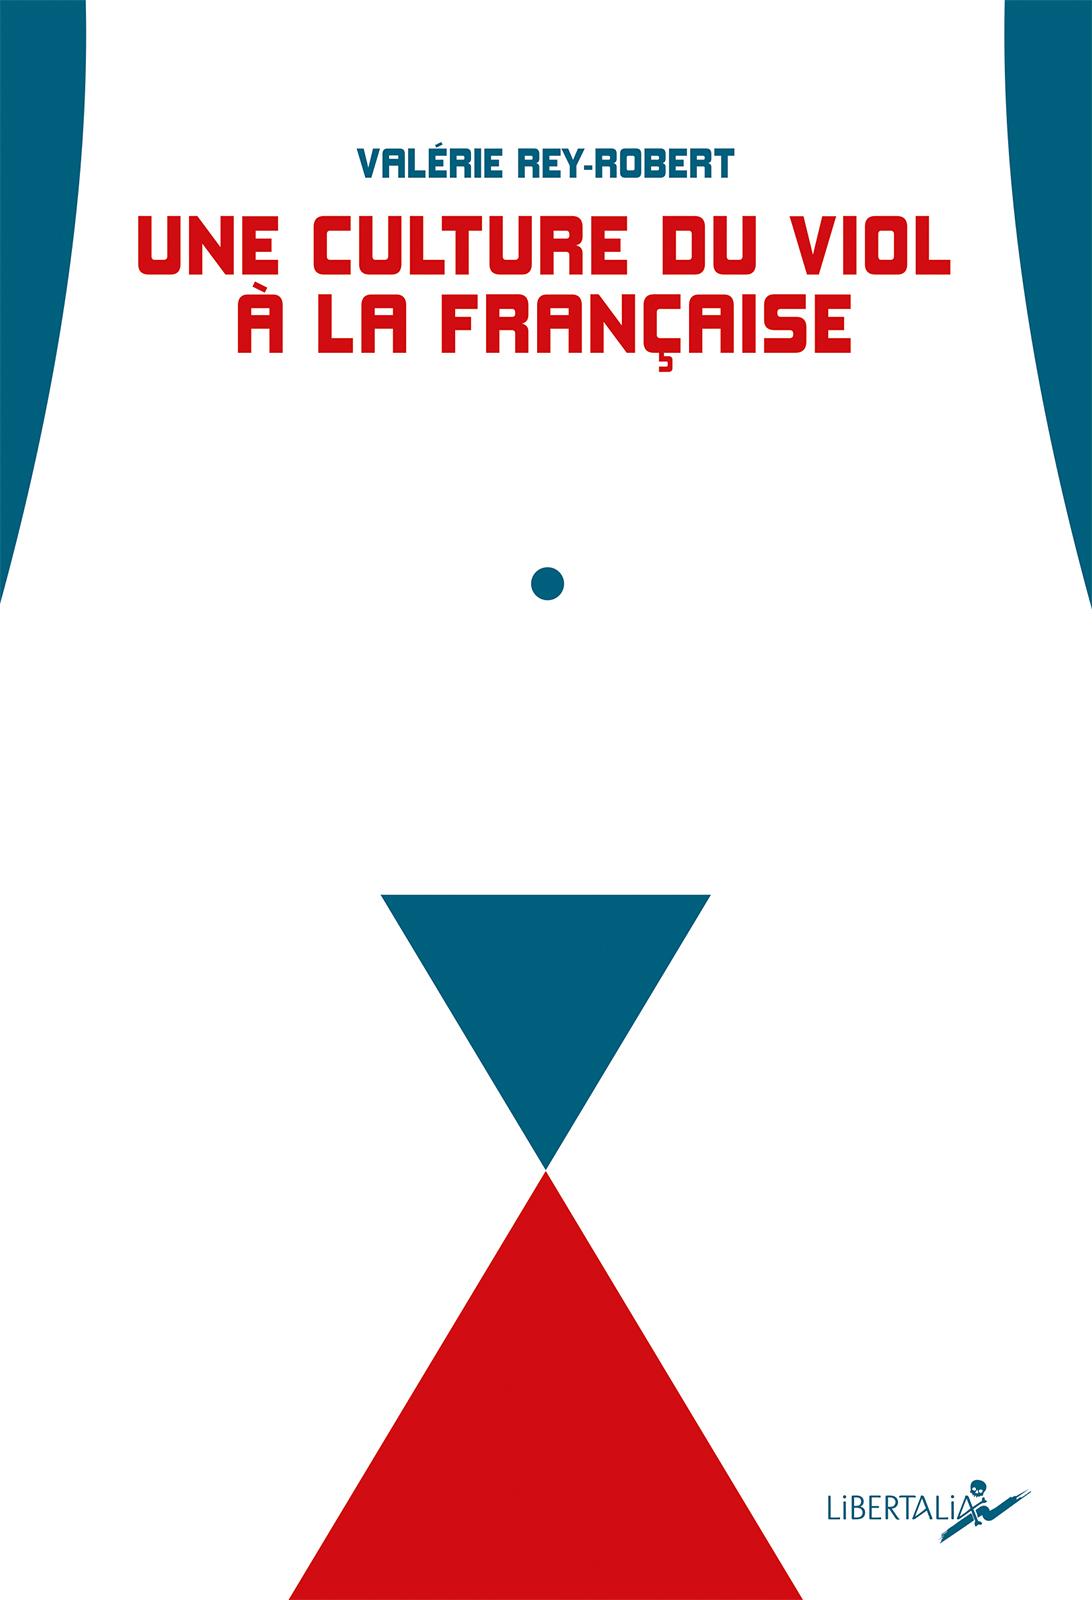 une culture du viol à la française valérie rey-robert libertalia bibliolingus